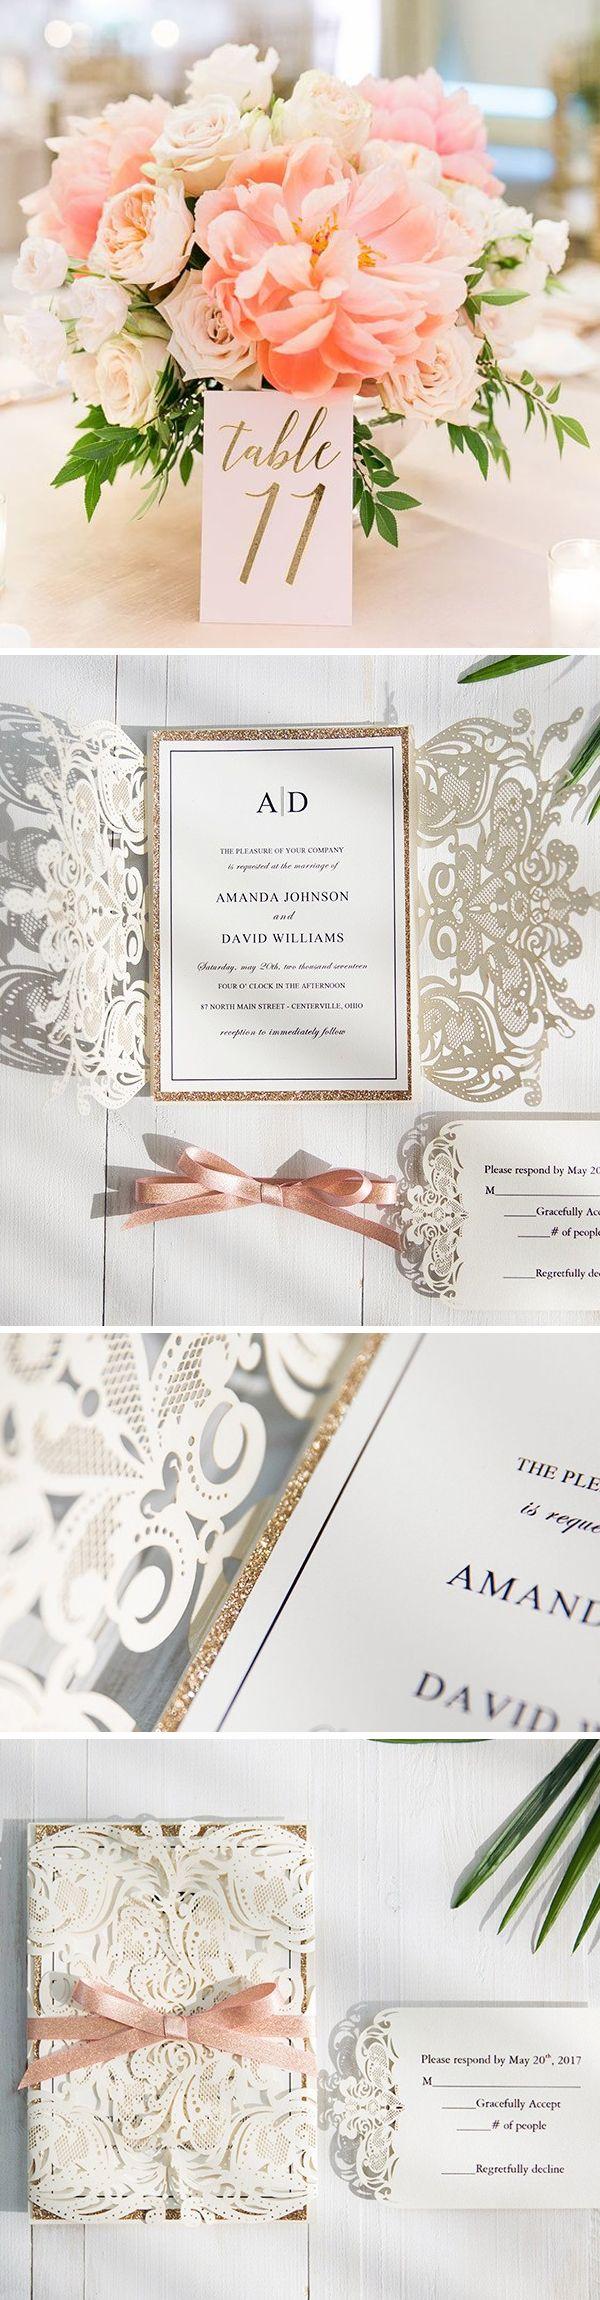 168 best Wedding card images on Pinterest | Invitations, Invitation ...